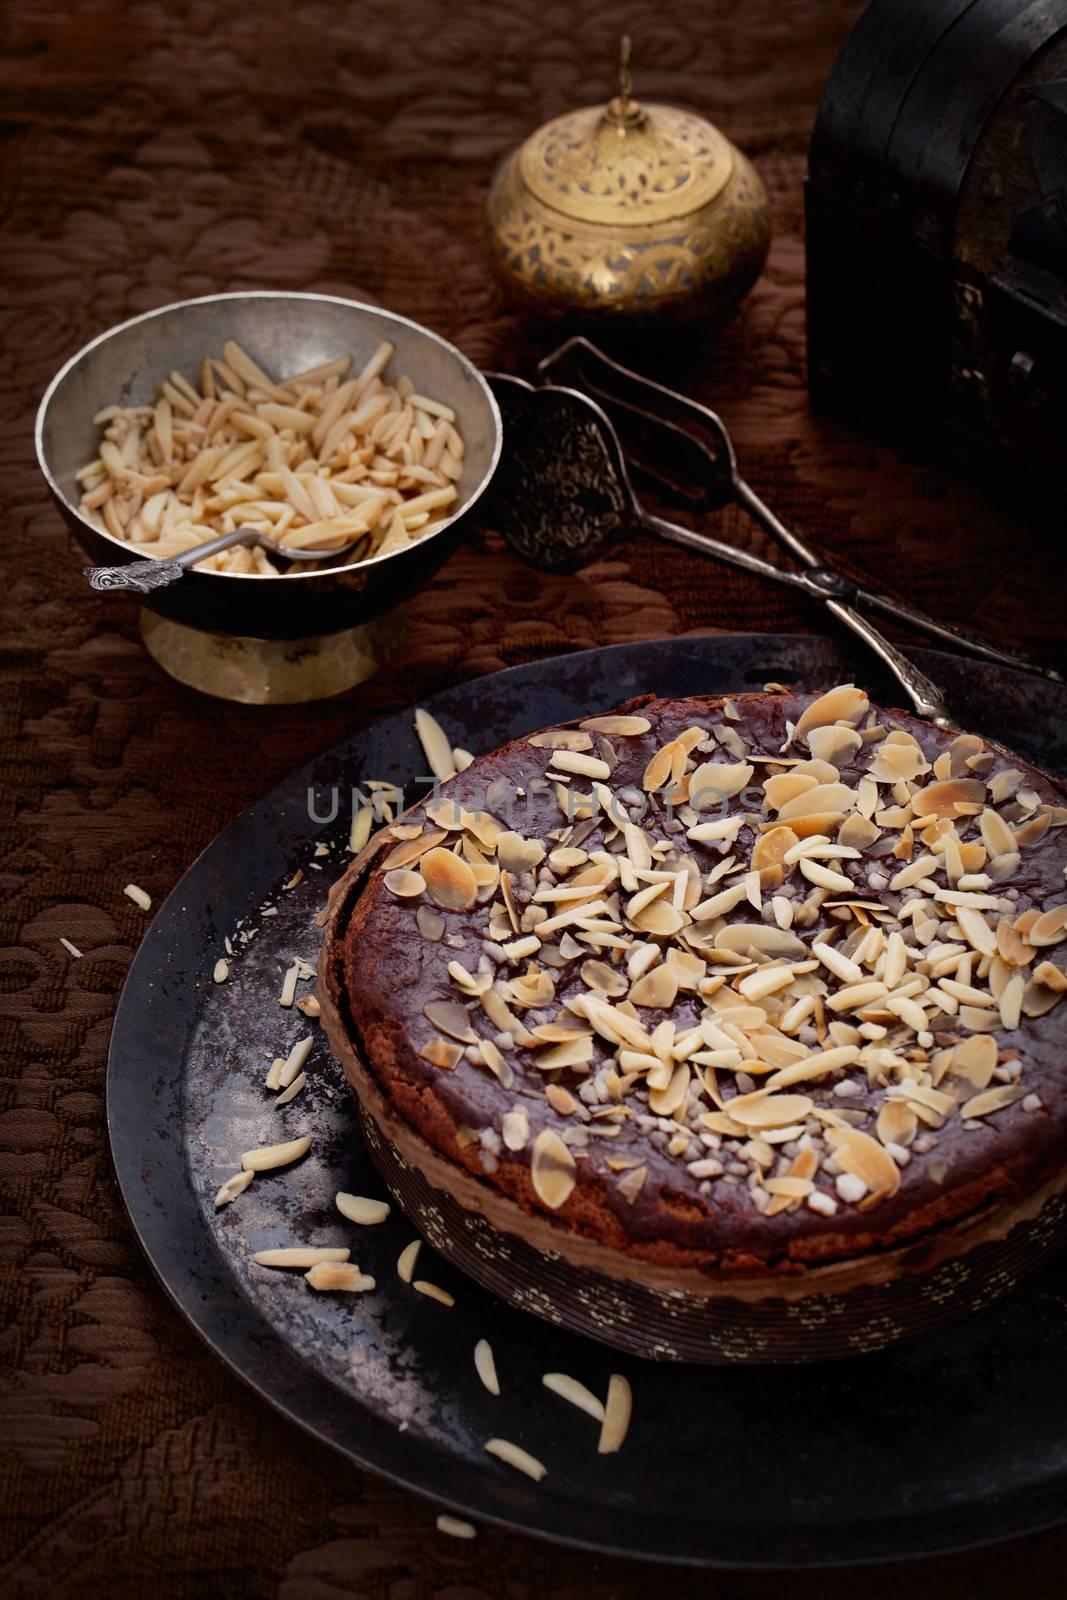 Chocolate pie. Vintage dessert tart with chocolate and almonds